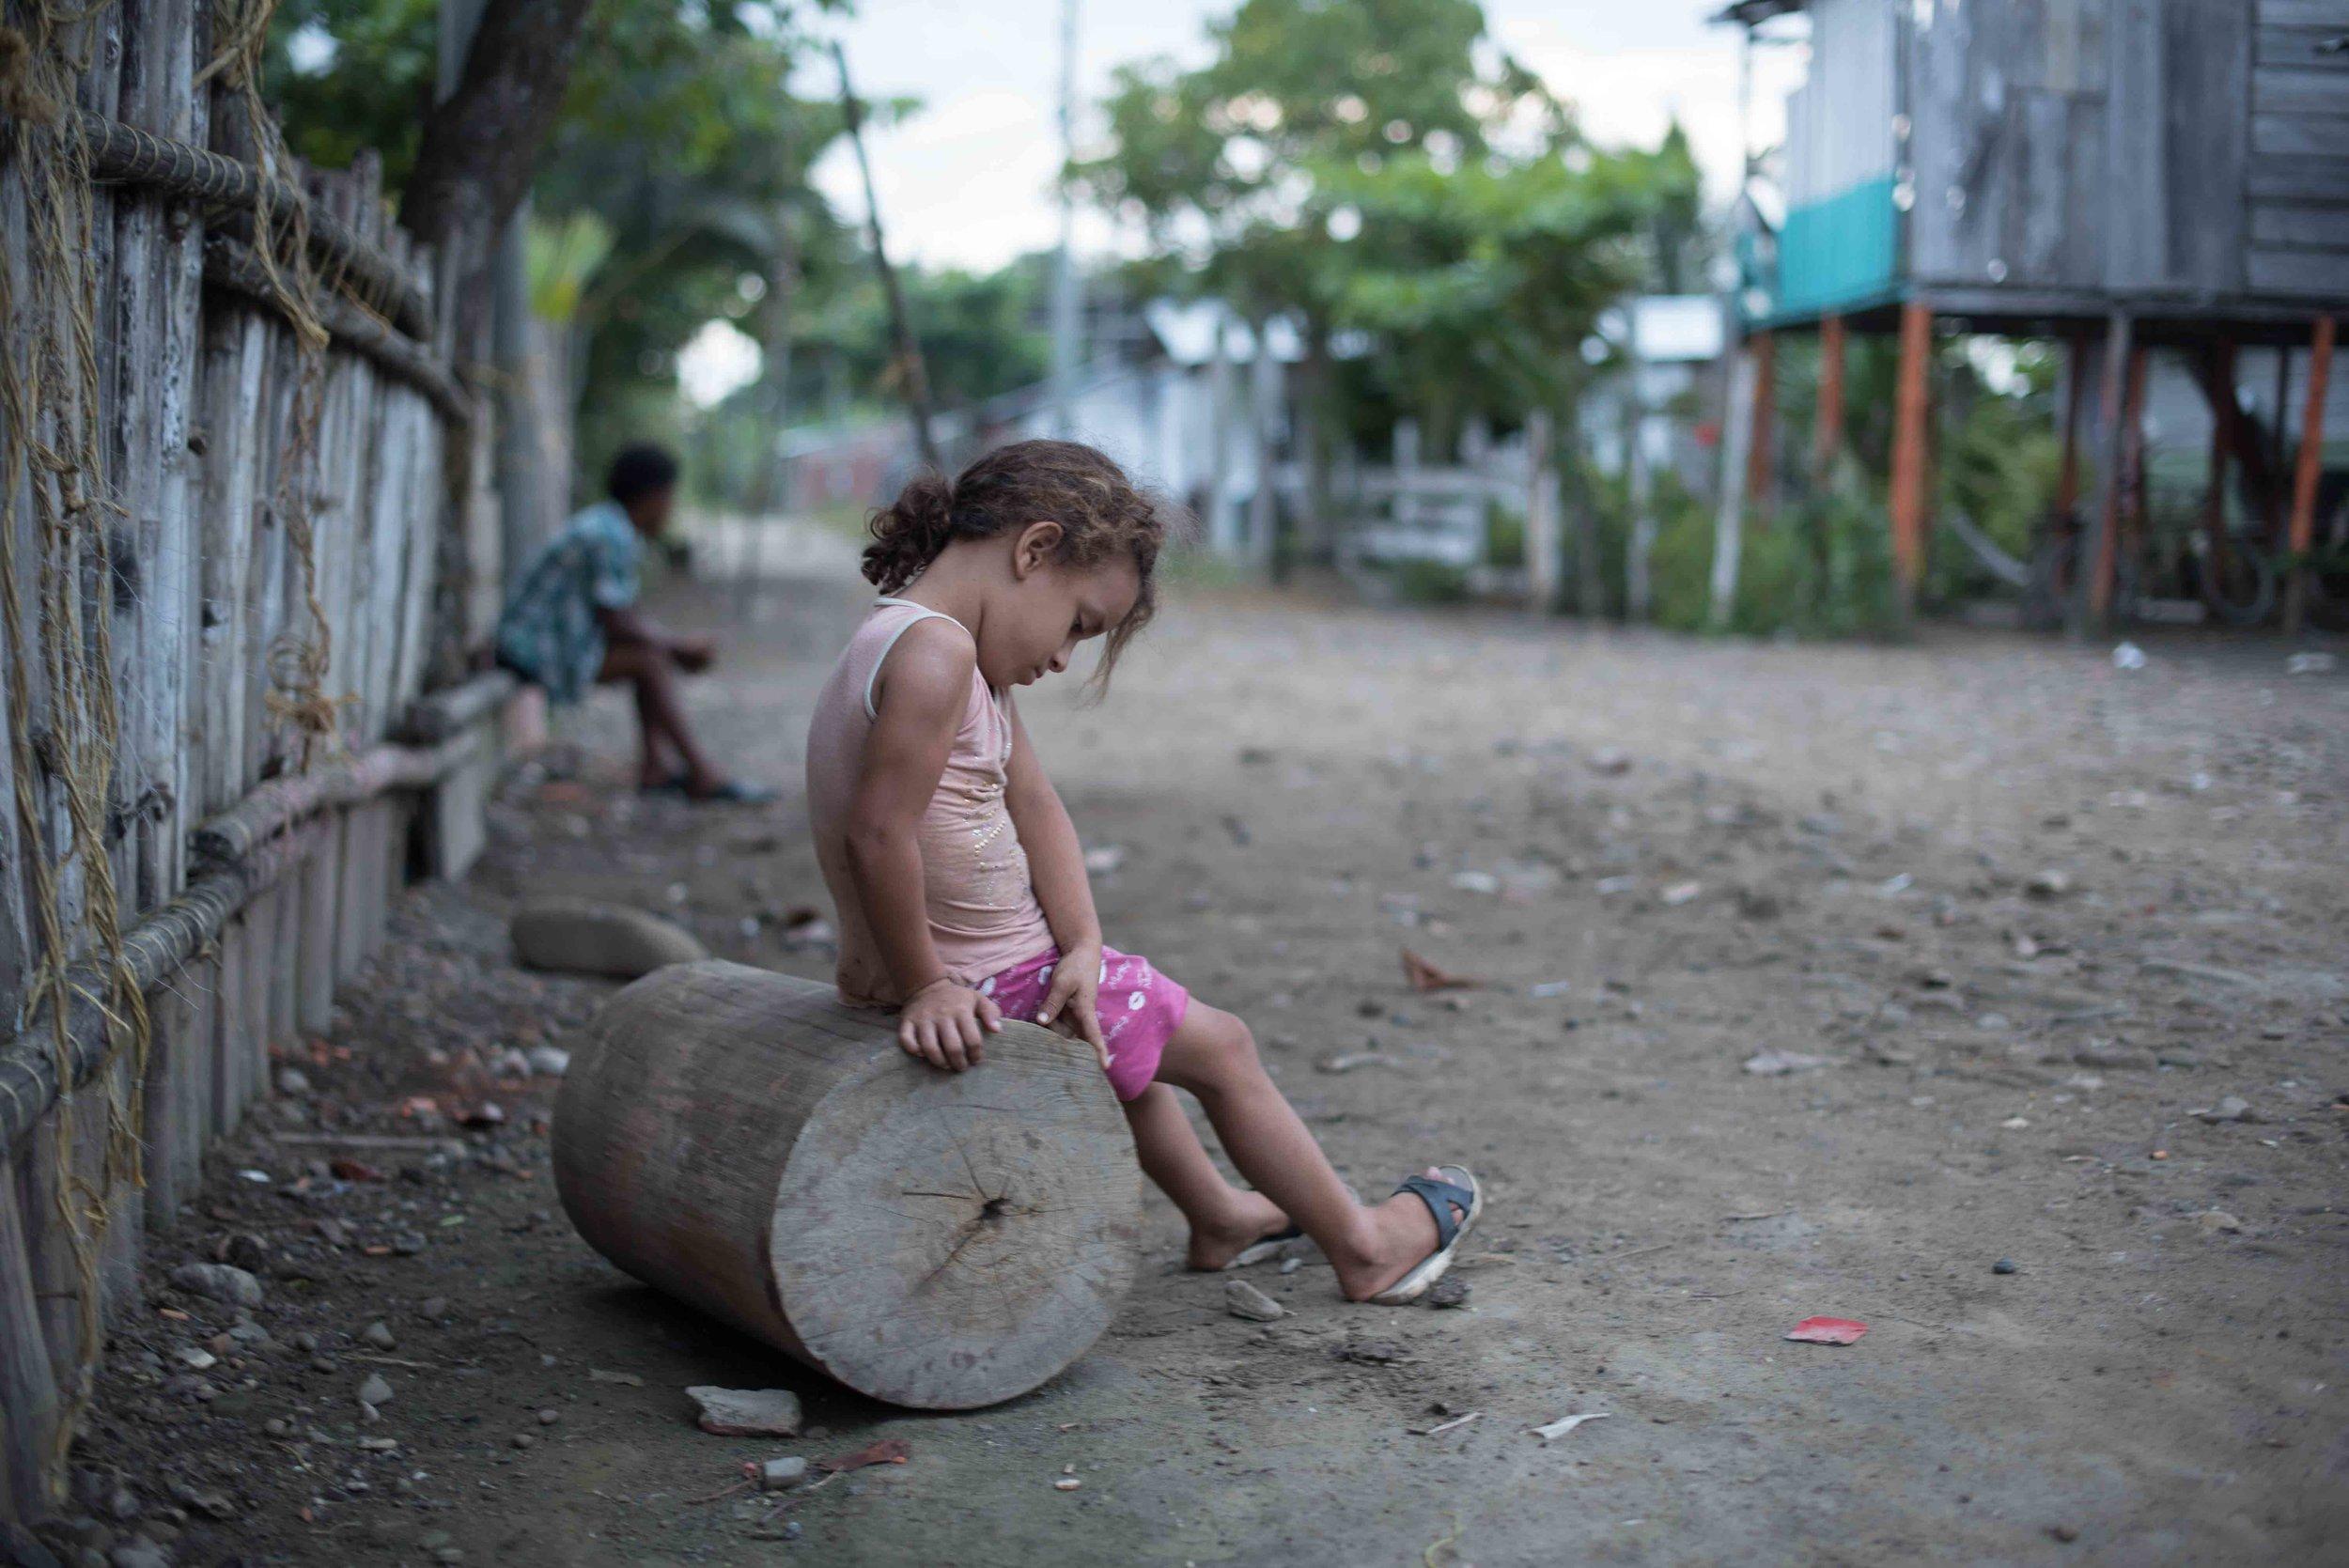 CHUNG-Colombia-20170809-4594-2.jpg